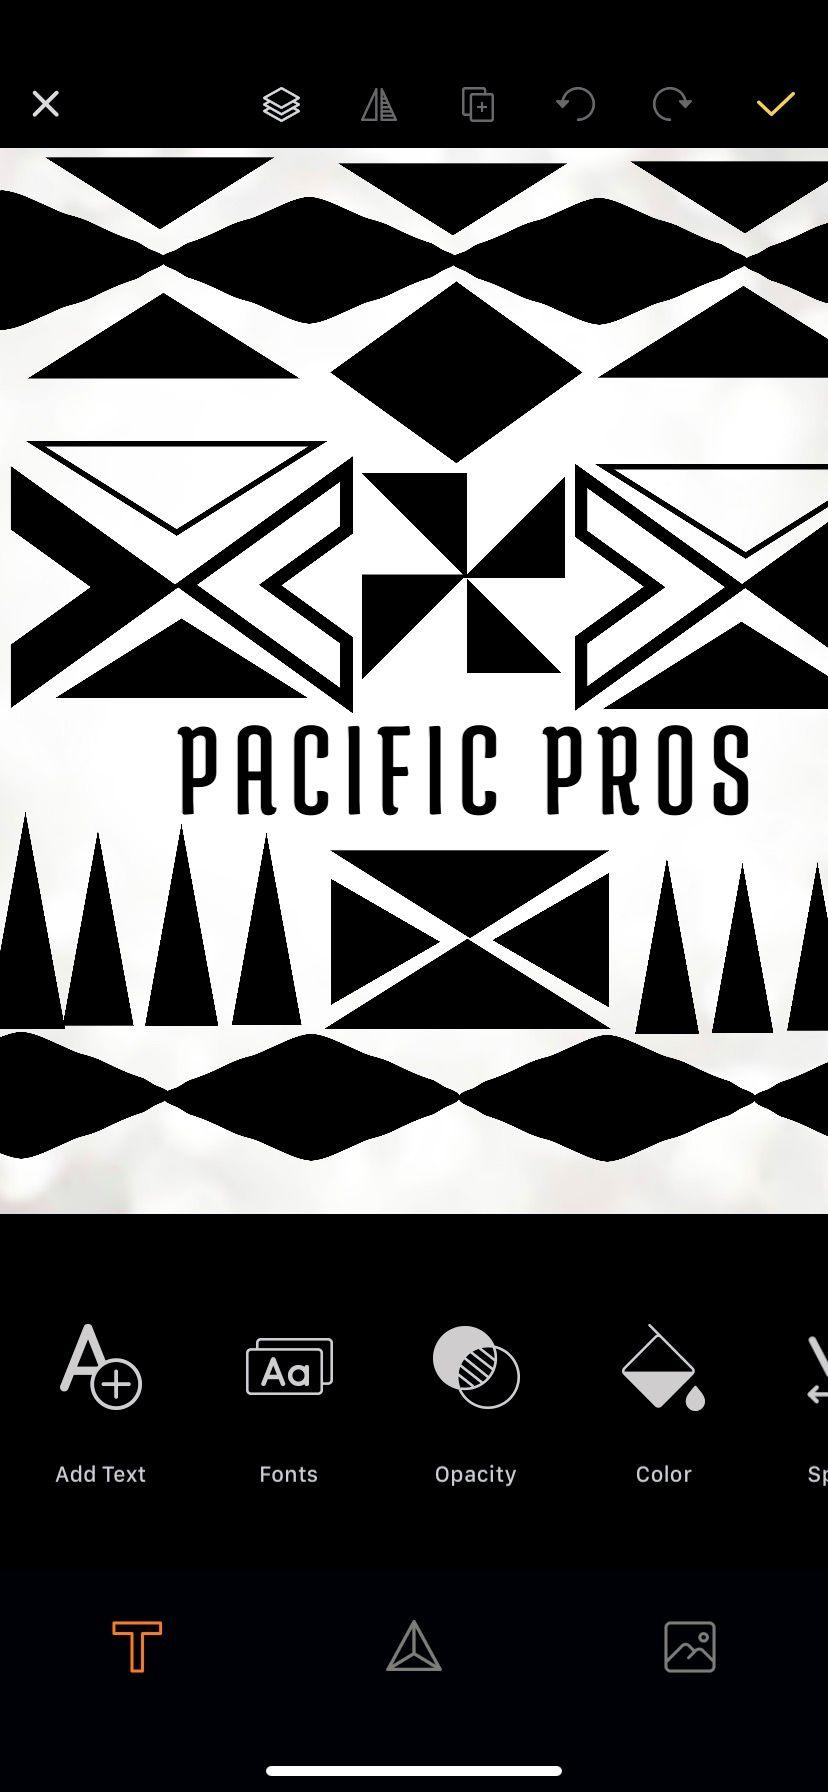 Pacific Pros